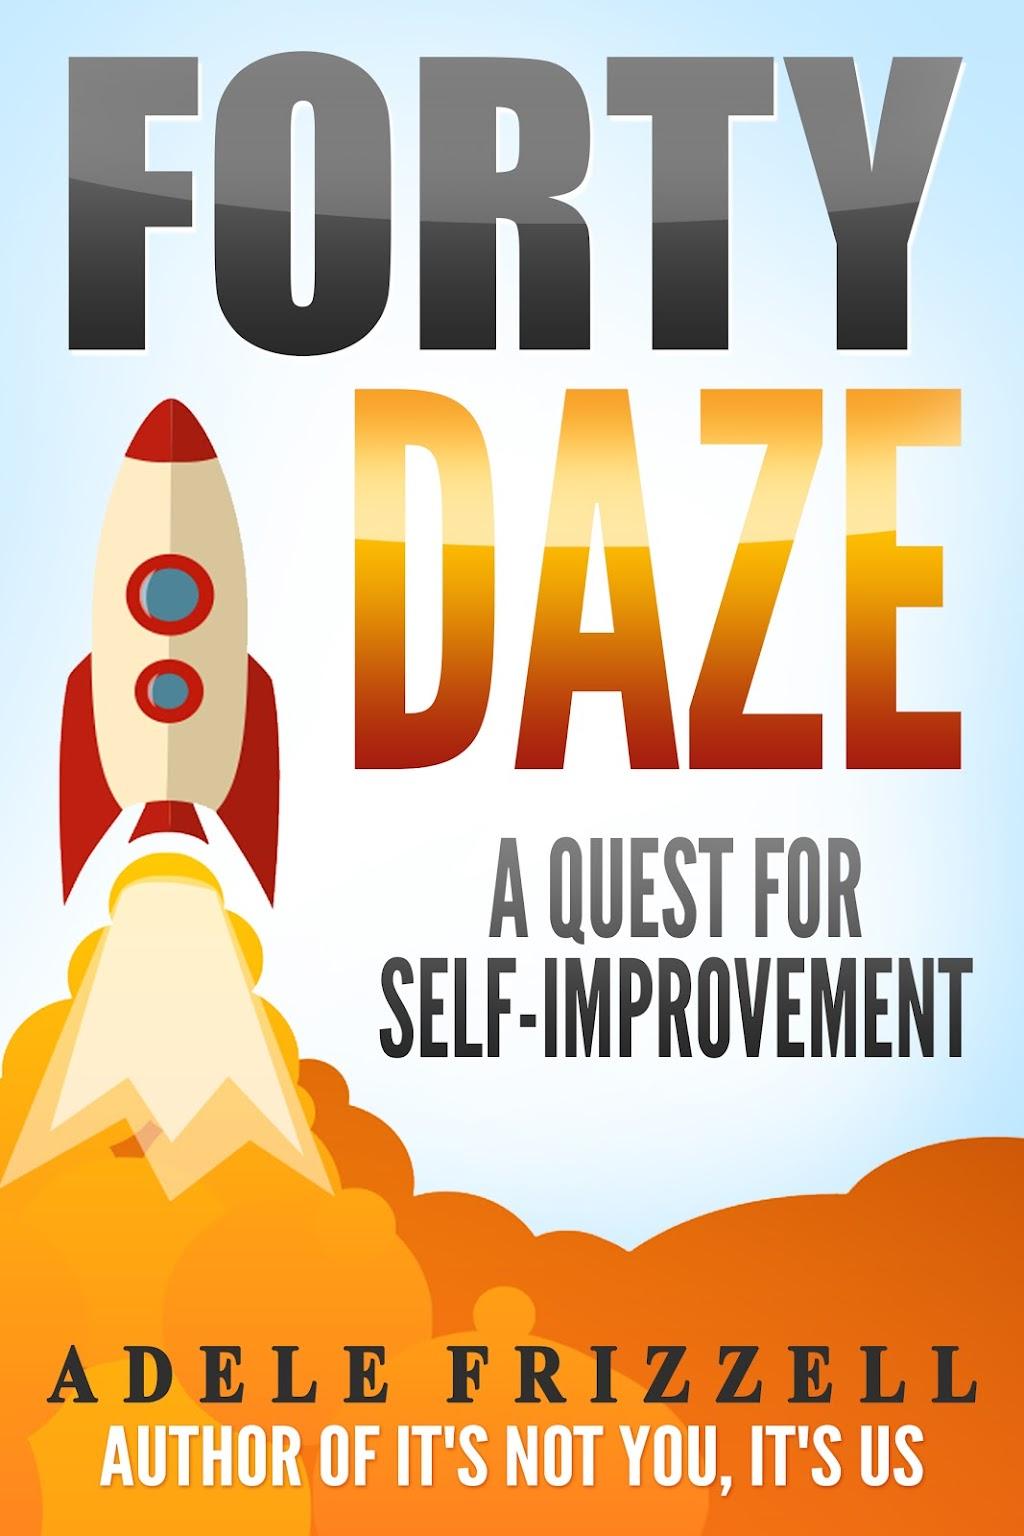 A Quest for Self-Improvement